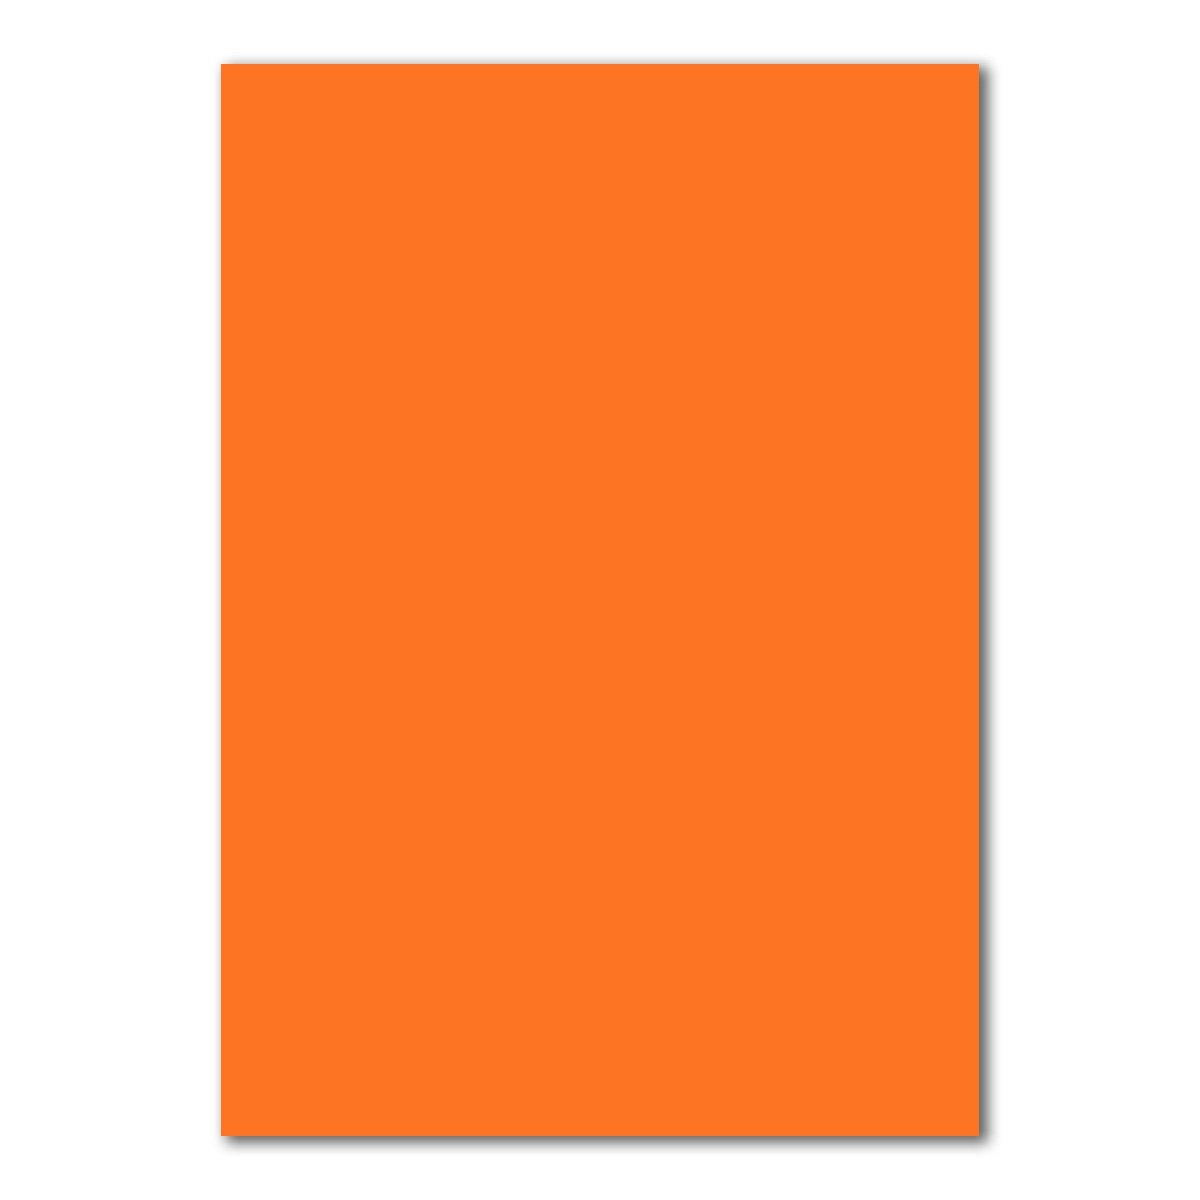 Gesamtparent FarbenFroh foglio in plano 50 Blatt 10-Hochwei/ß 160/g//m/² Foglio di carta DIN A4